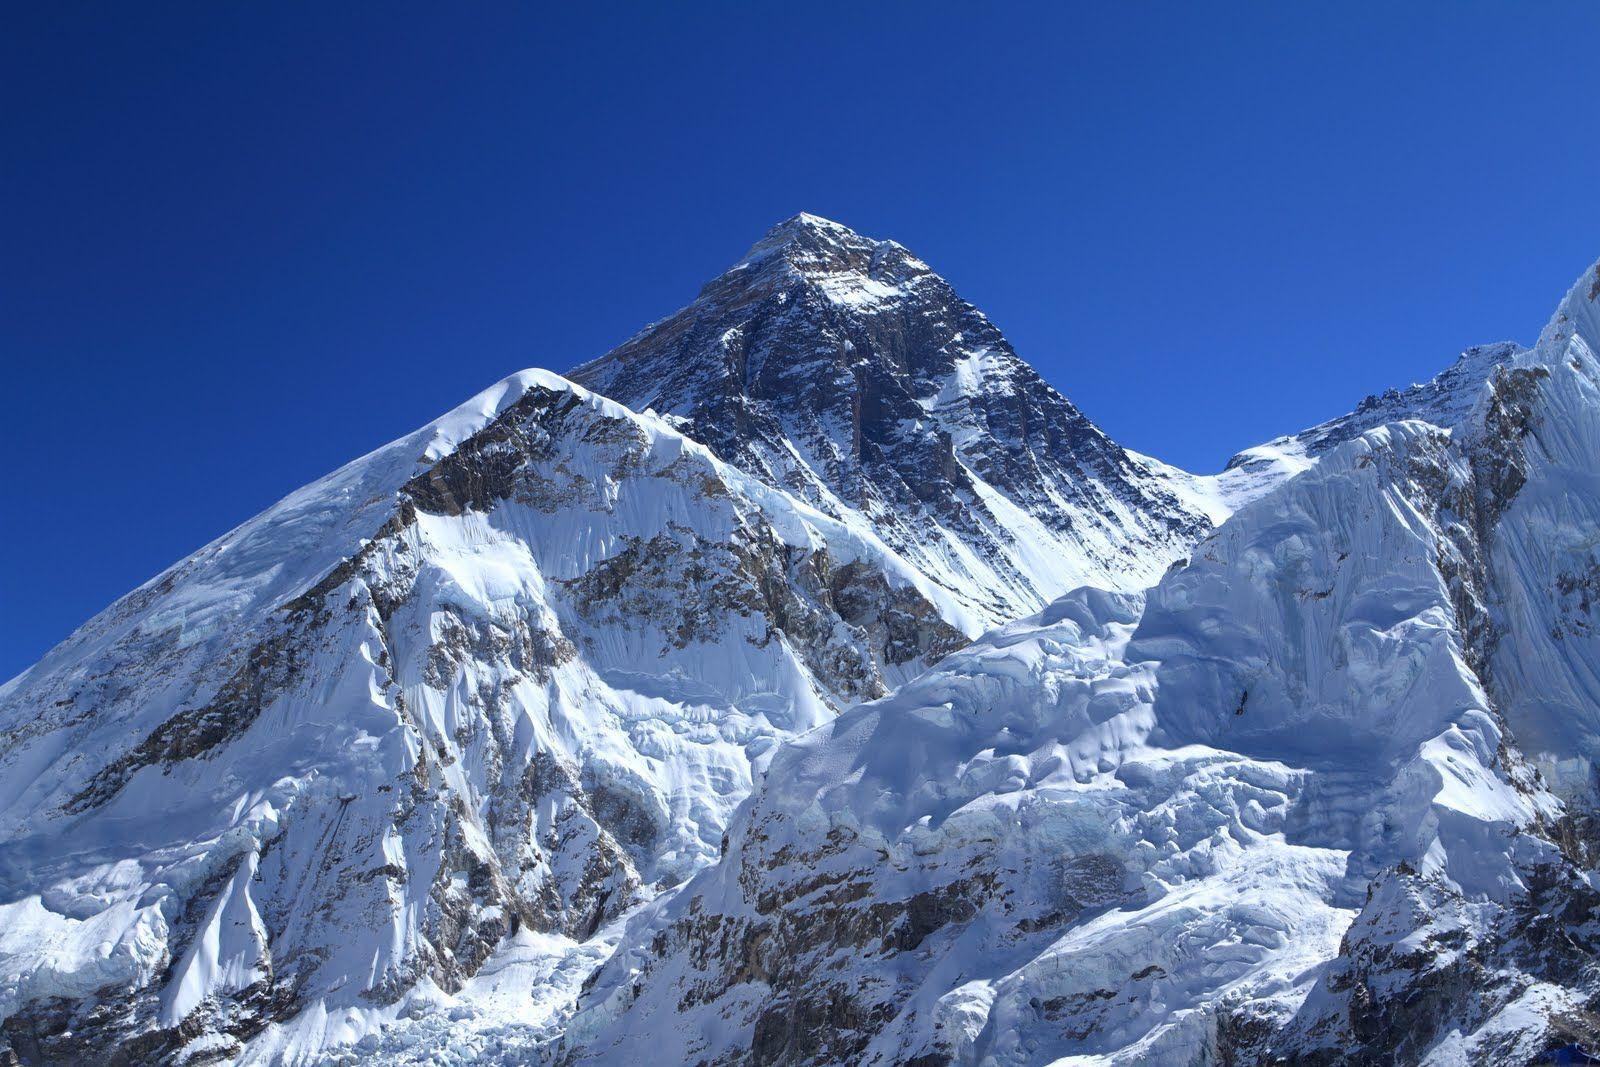 Mount Everest 8850m